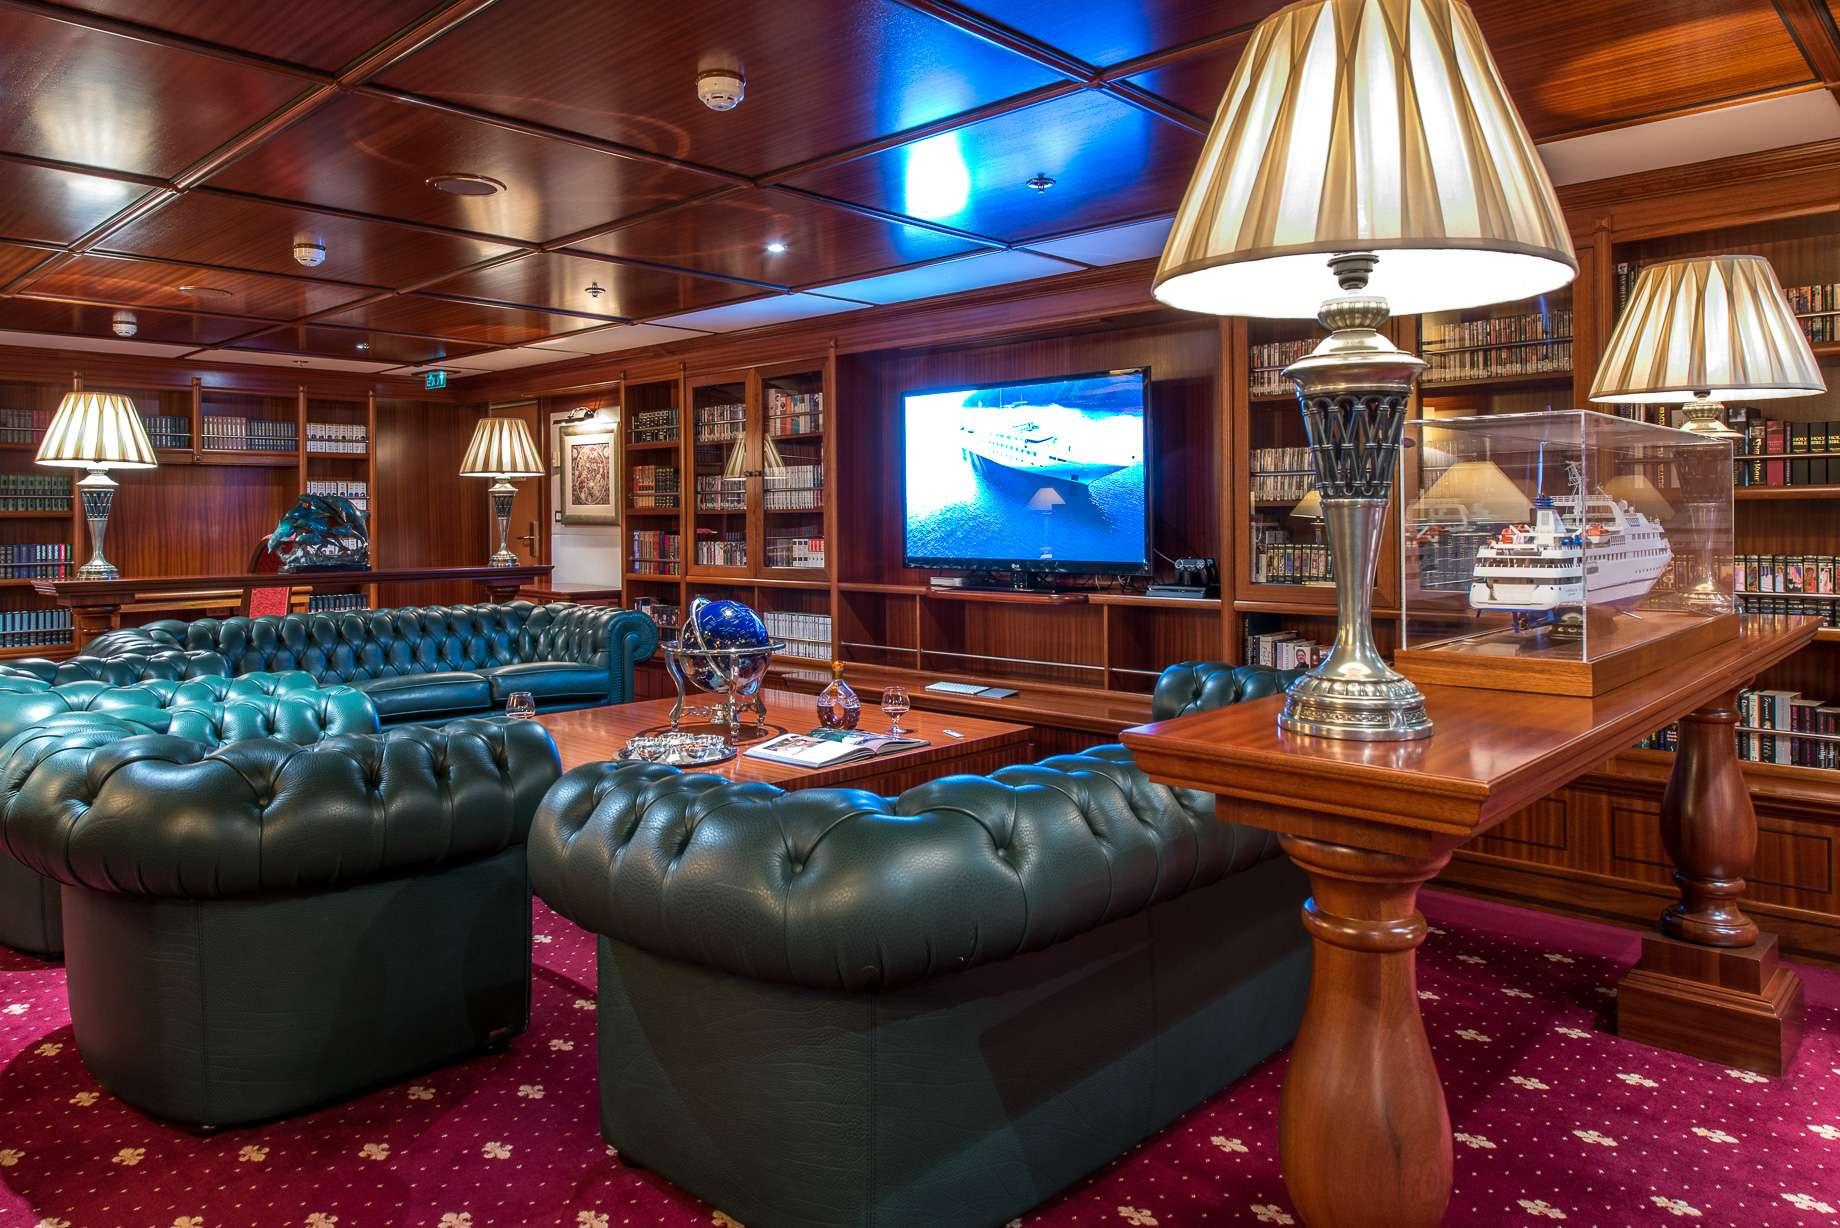 Motor Yacht 'LAUREN L' Library, 40 PAX, 295.00 Ft, 90.00 Meters, Built 2002, Cassens Werft, Refit Year 2008/2015